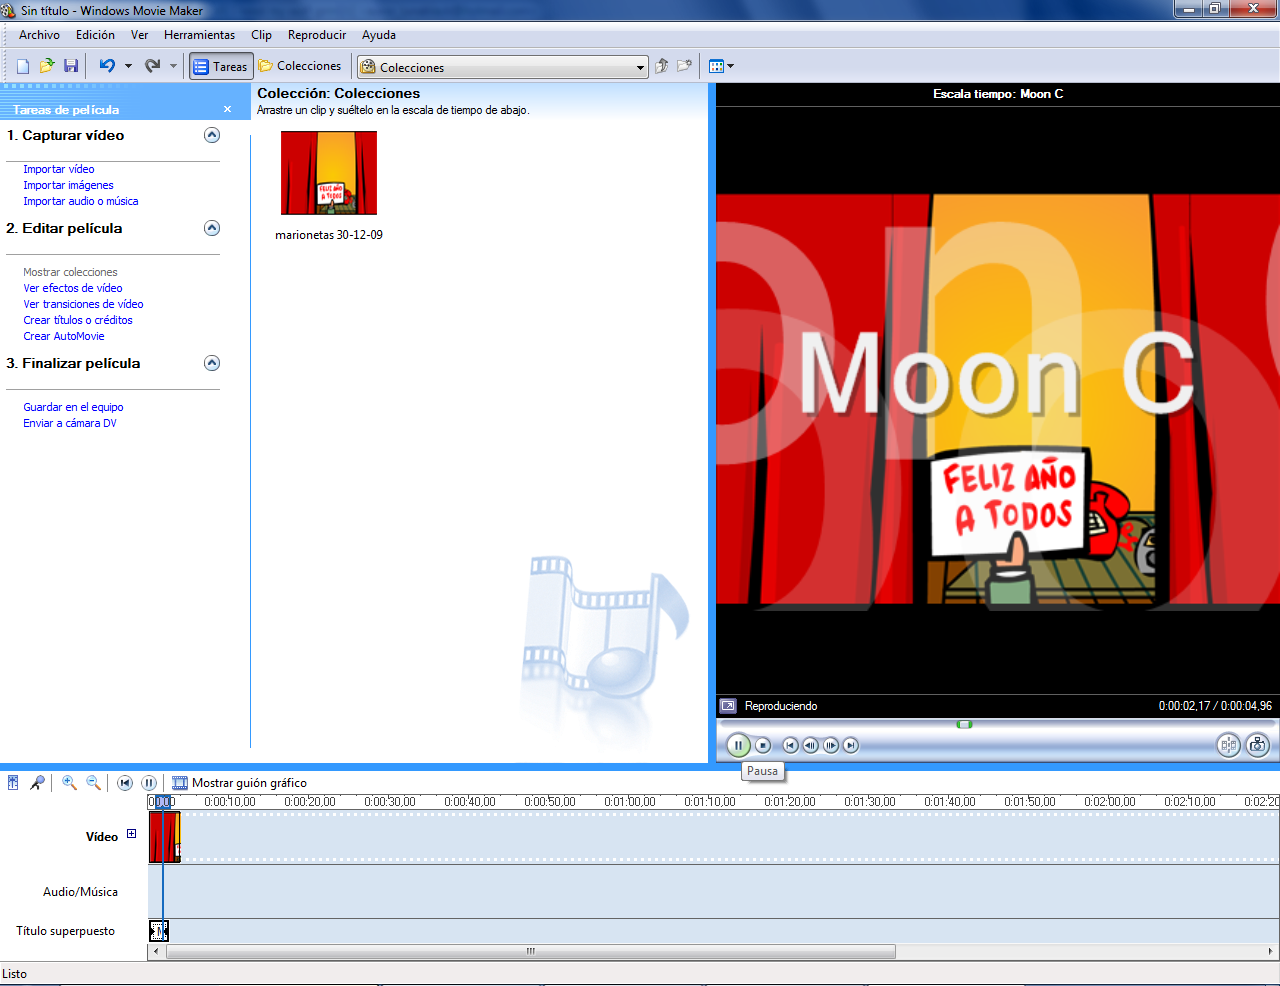 windows movie maker para windows 7 moon c